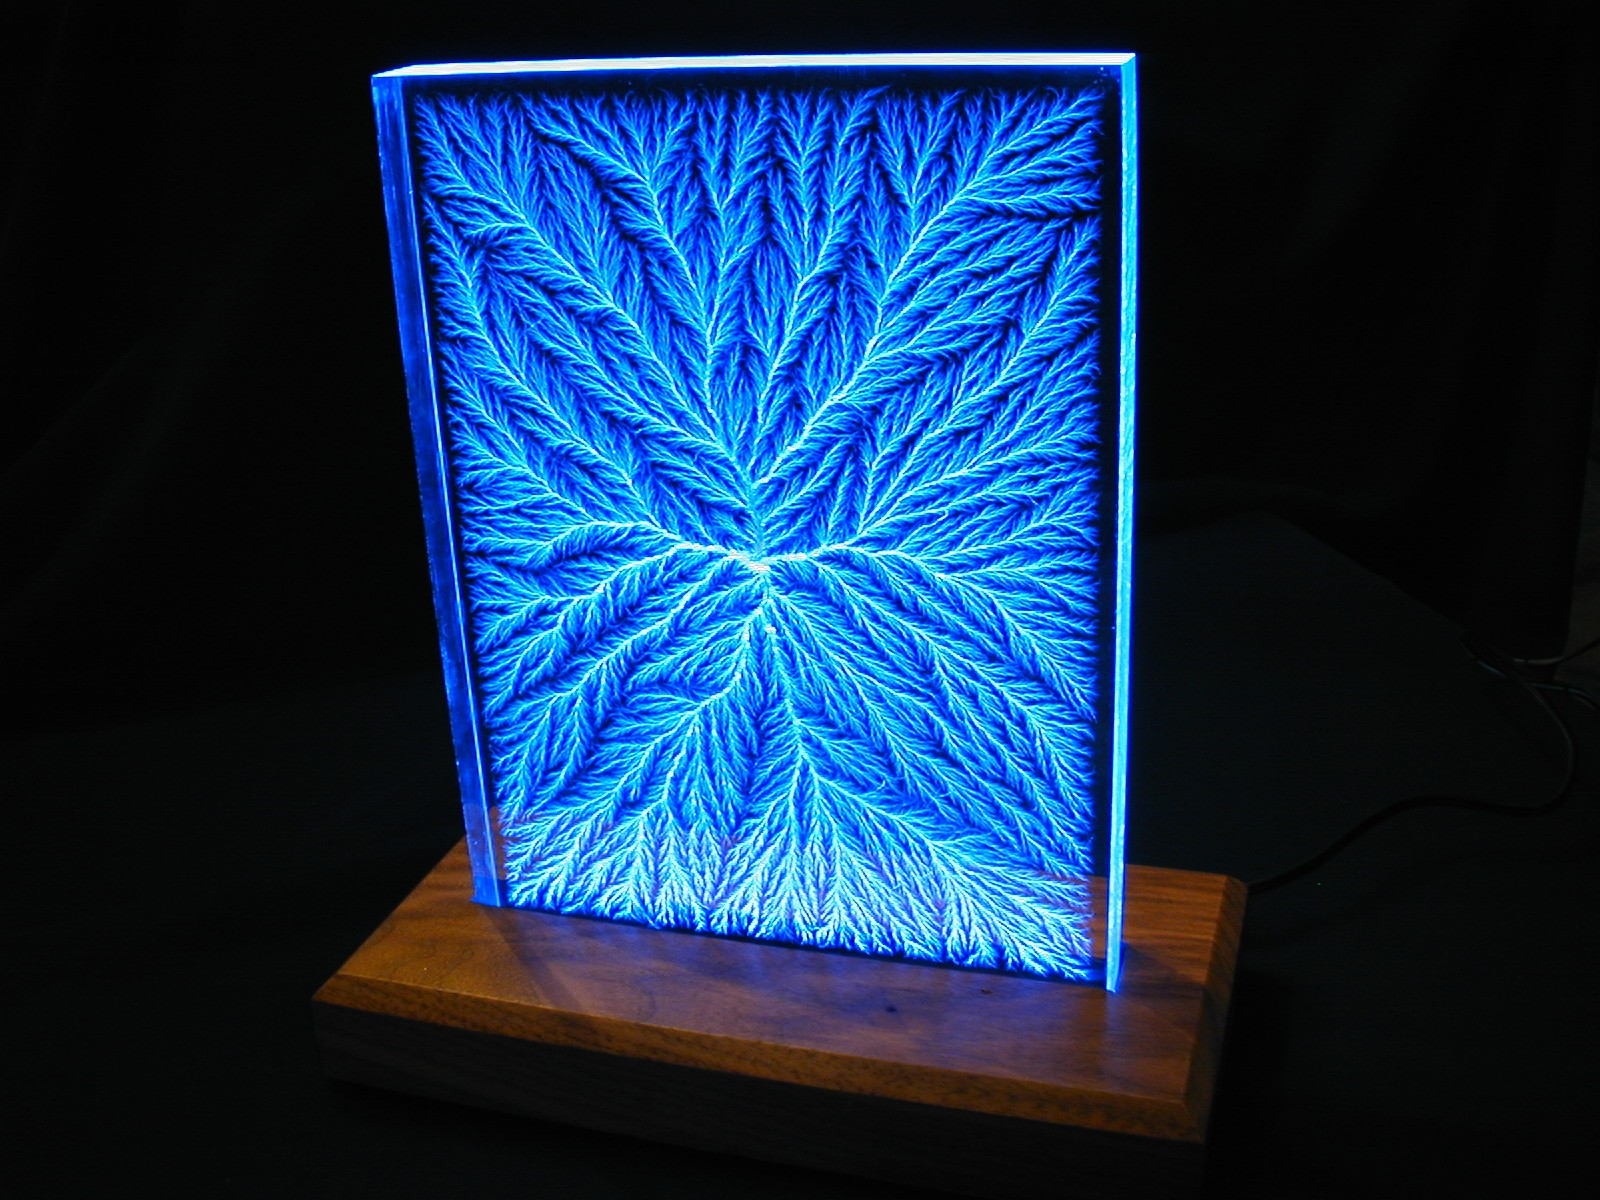 Гравировка на стекле 6